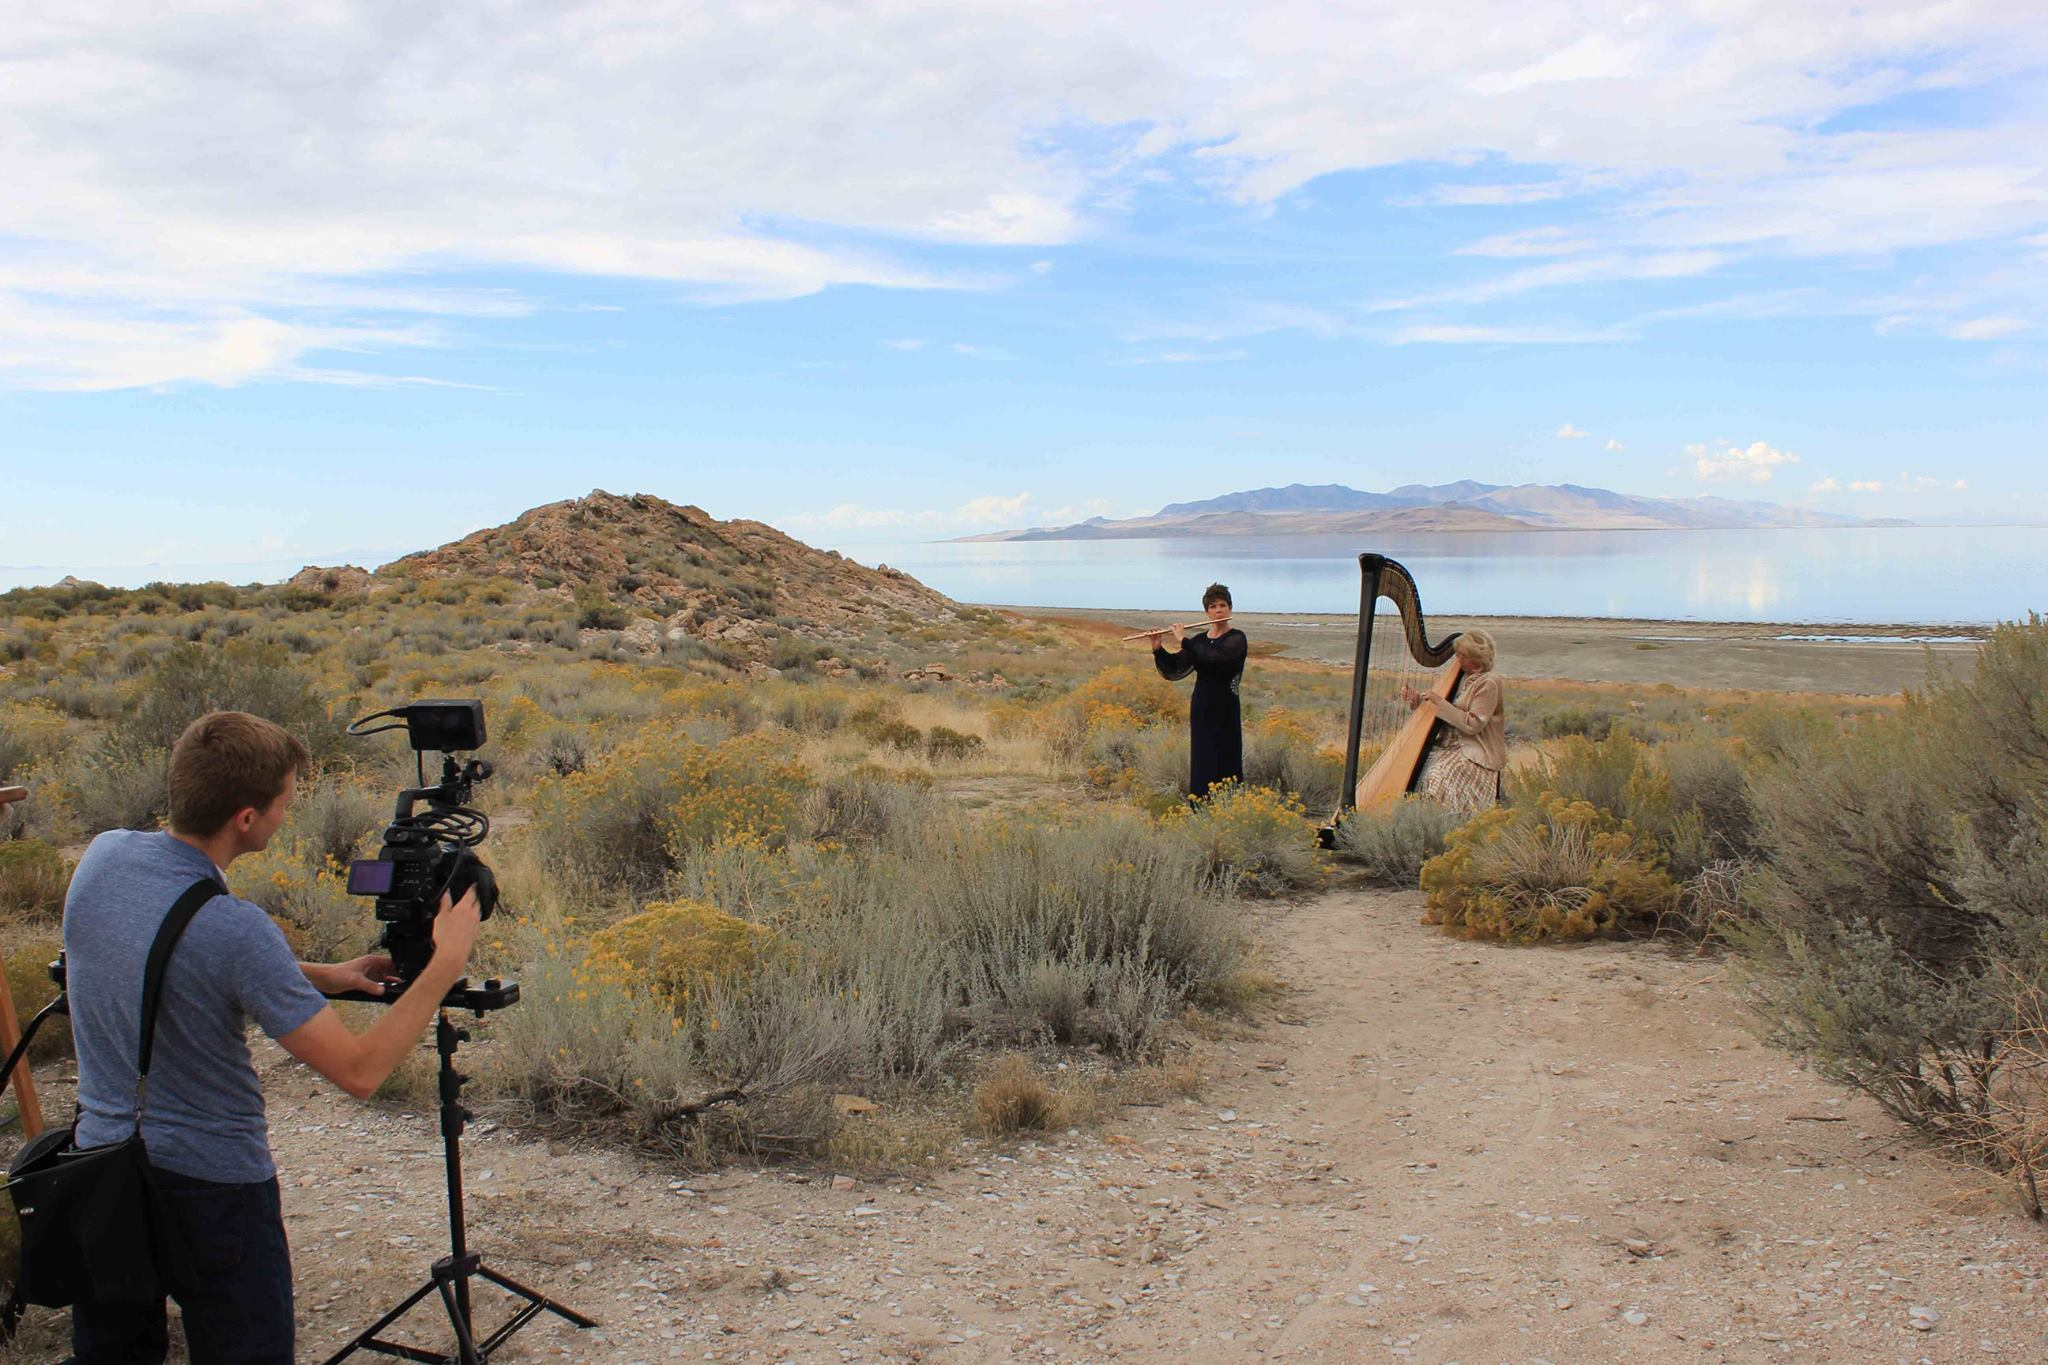 Jeannine Goeckeritz - Flute - Tamara Oswald - Harop - Behind the Scenes - Music Video Shoot - Media.jpg